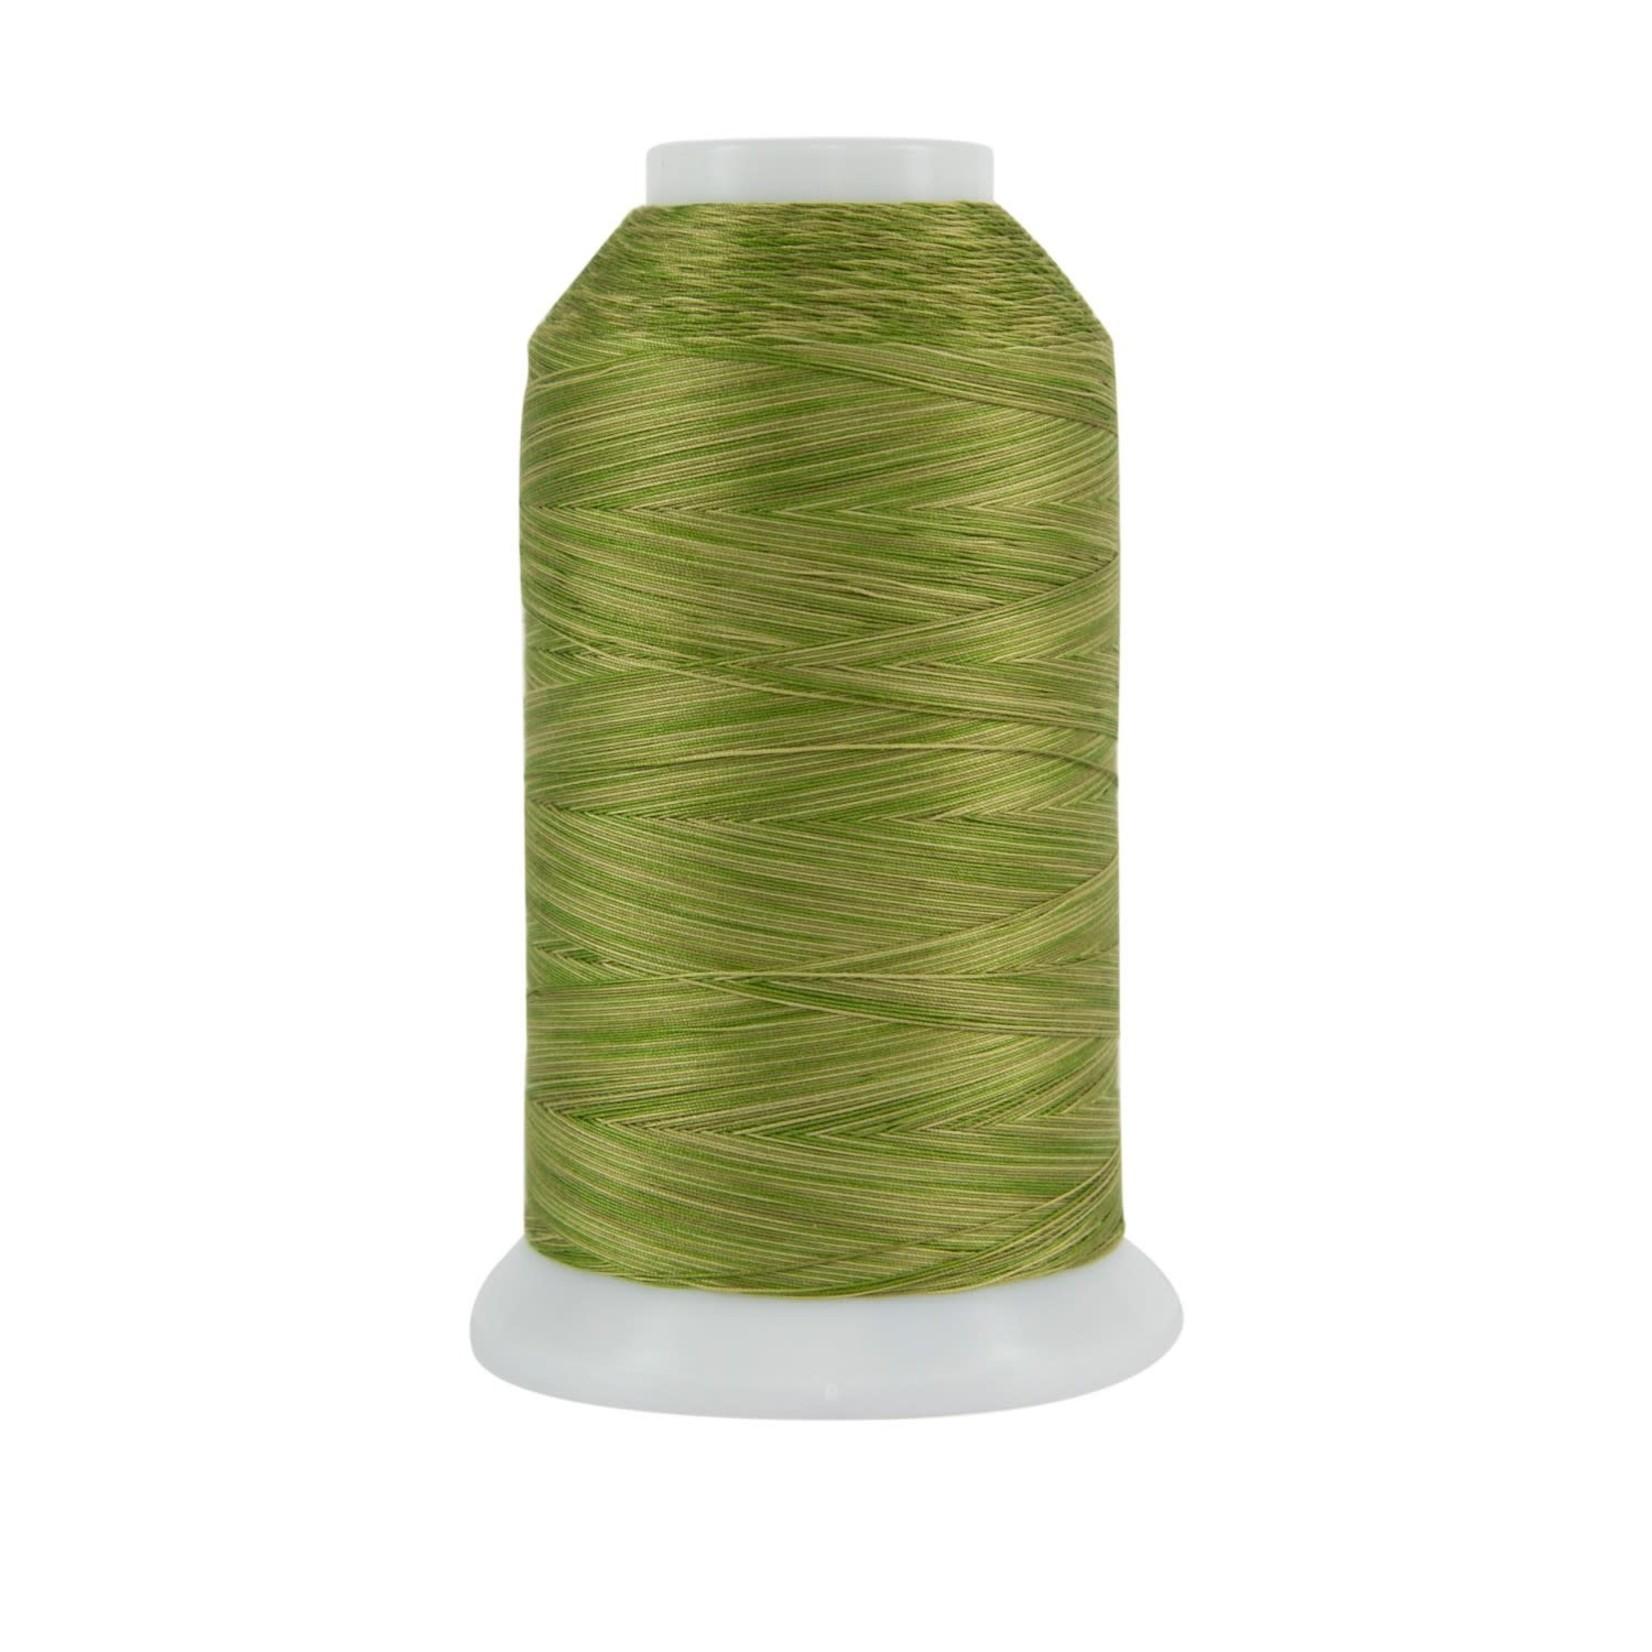 Superior Threads King Tut - #40 - 1828 m - 0990 Green Olives